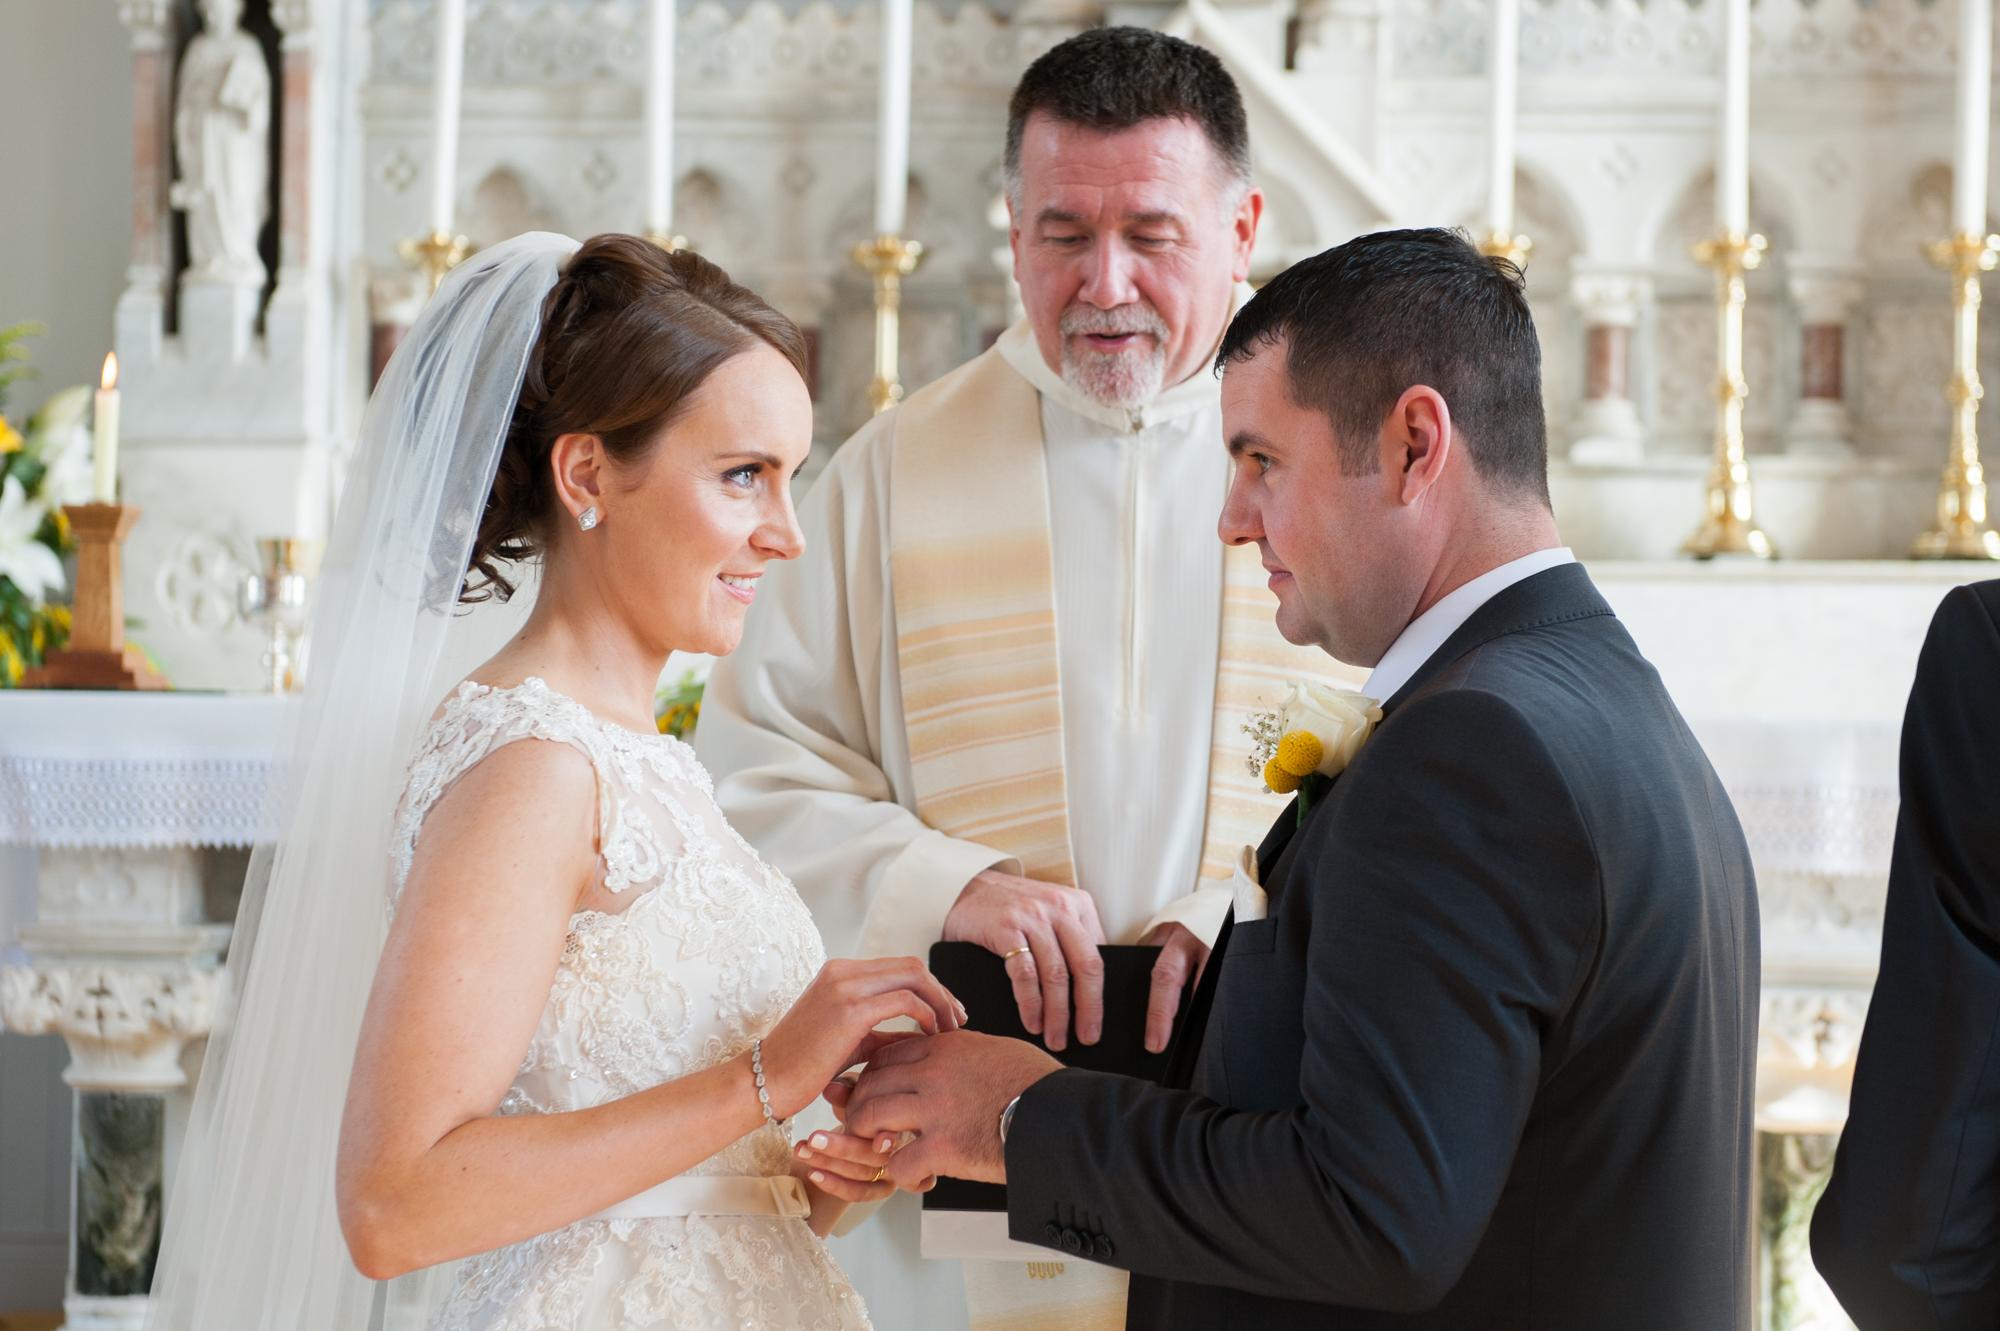 Michael_Gill_Photography_Wedding_Greencastle_Lousie_Jason_Donegal-9.jpg